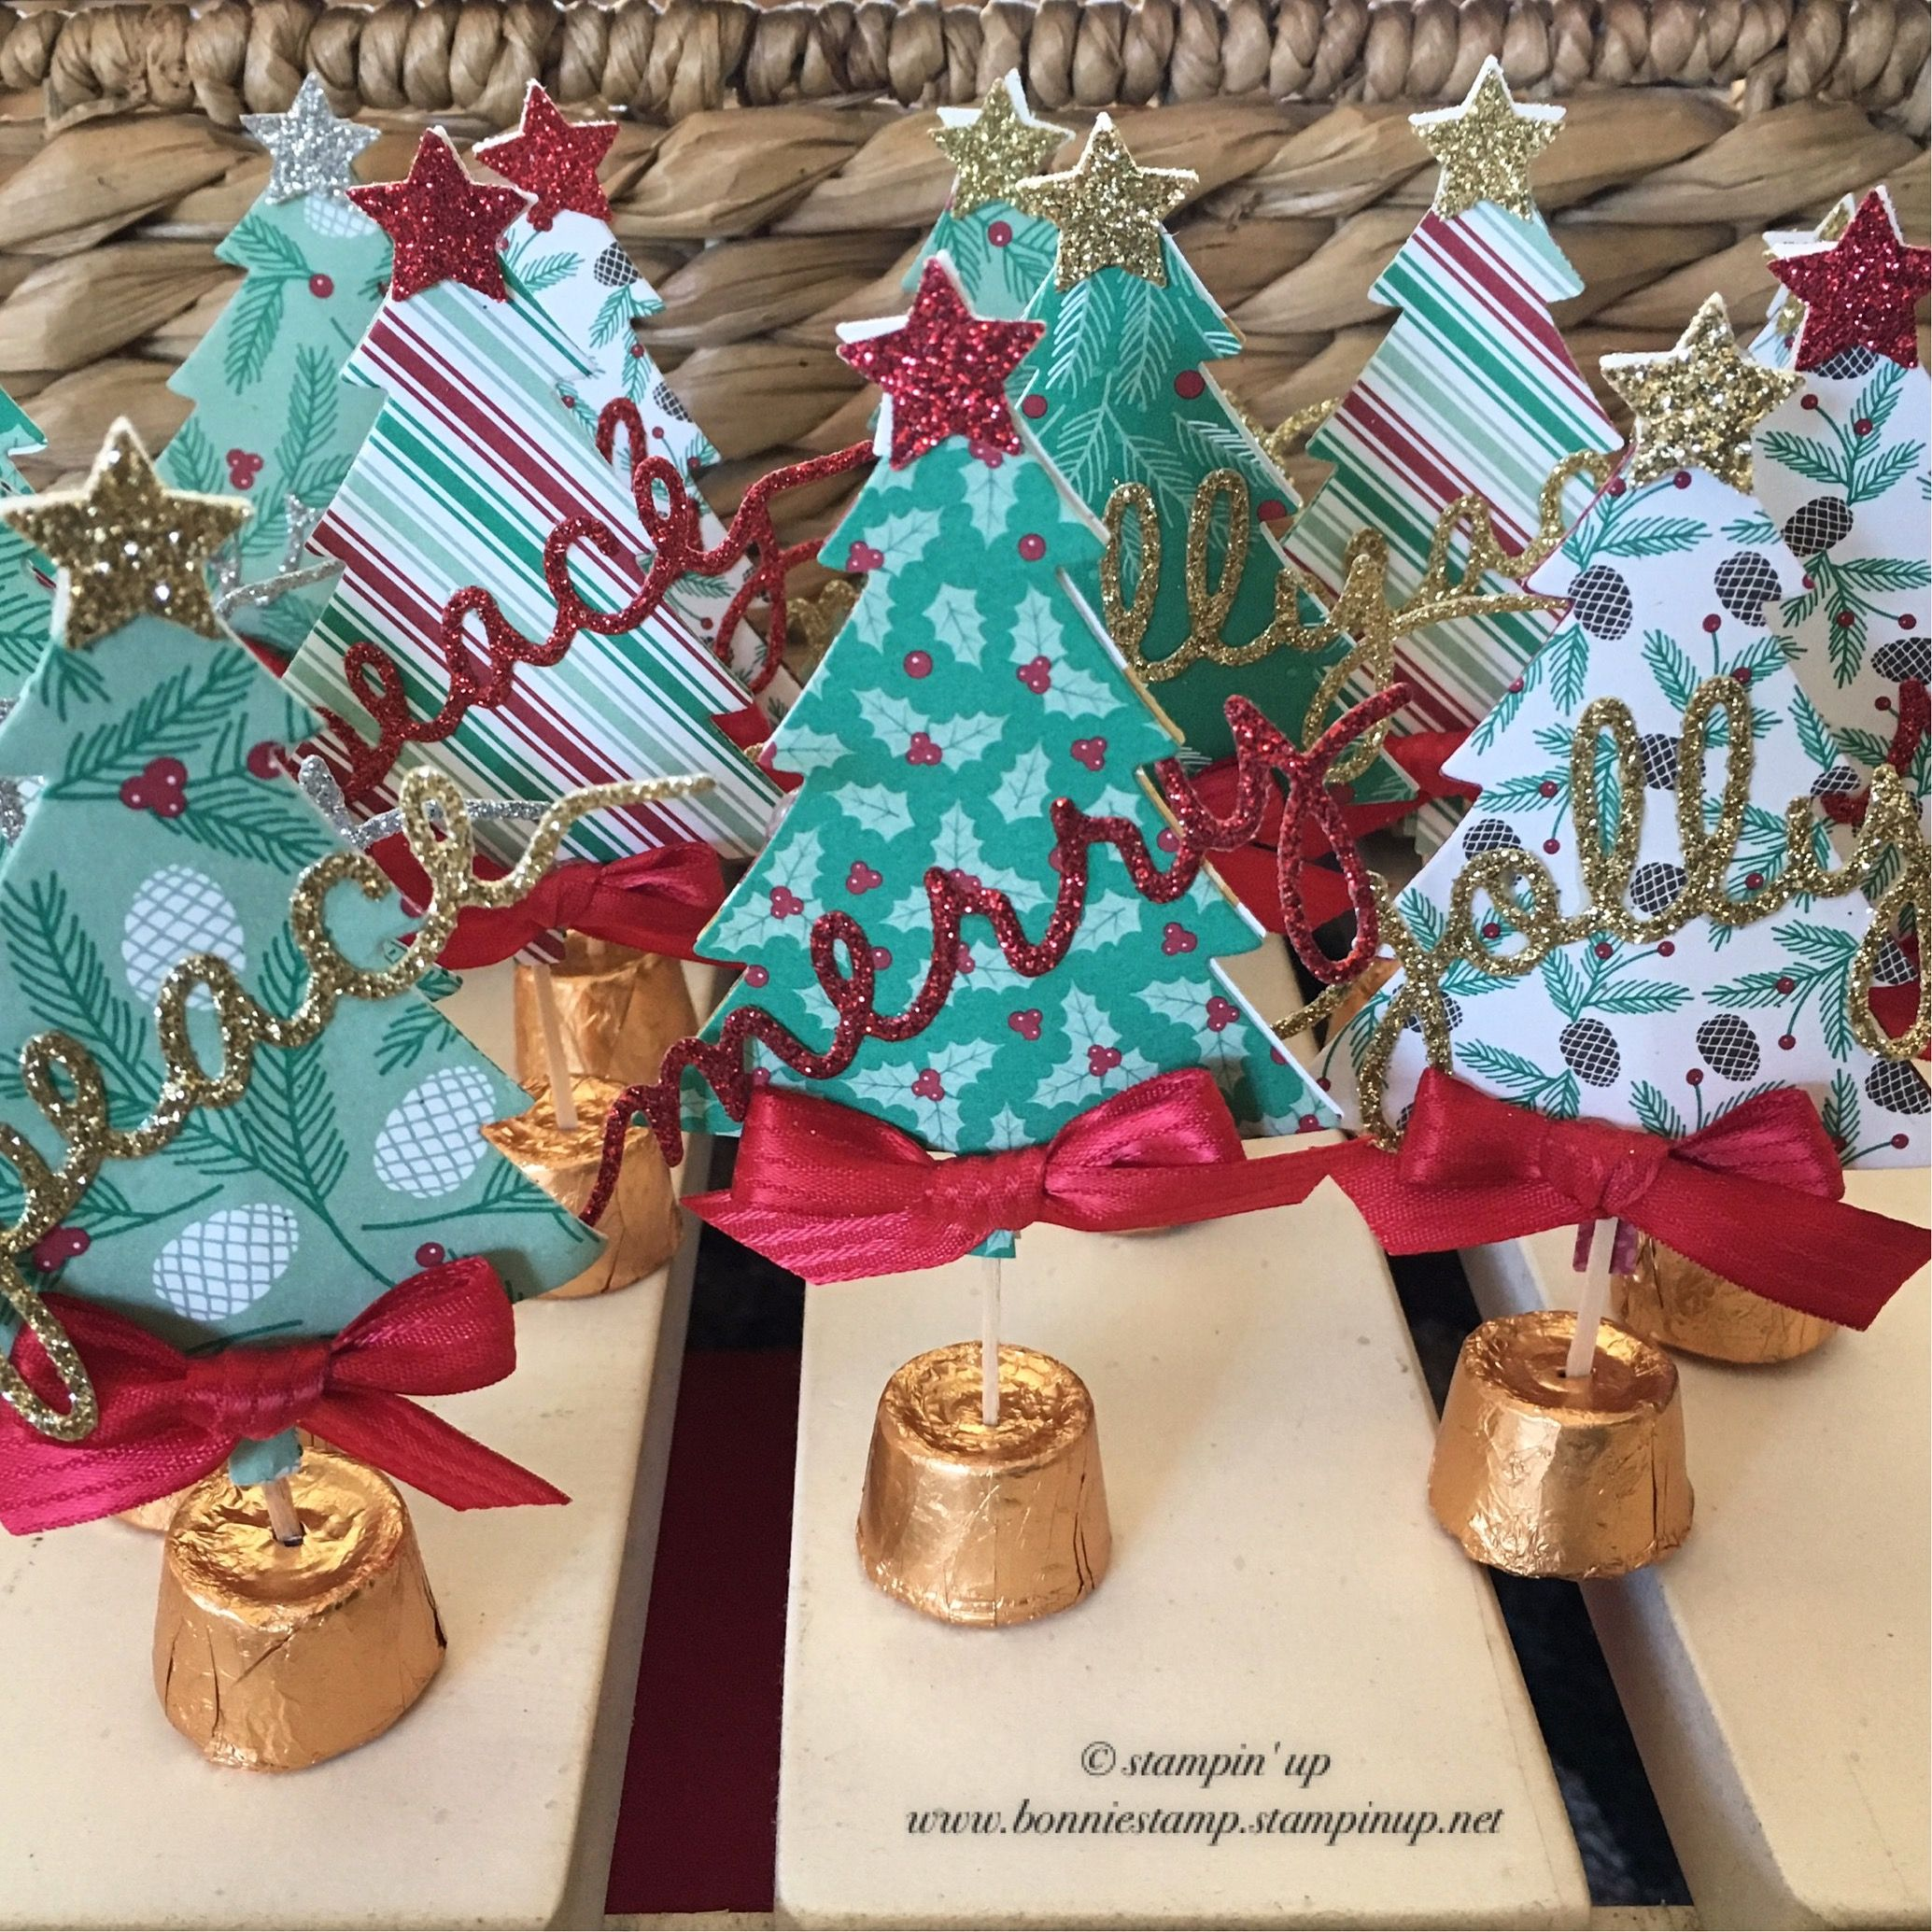 171 Best Project Ideas Images On Pinterest: Best 25+ Christmas Thank You Ideas On Pinterest